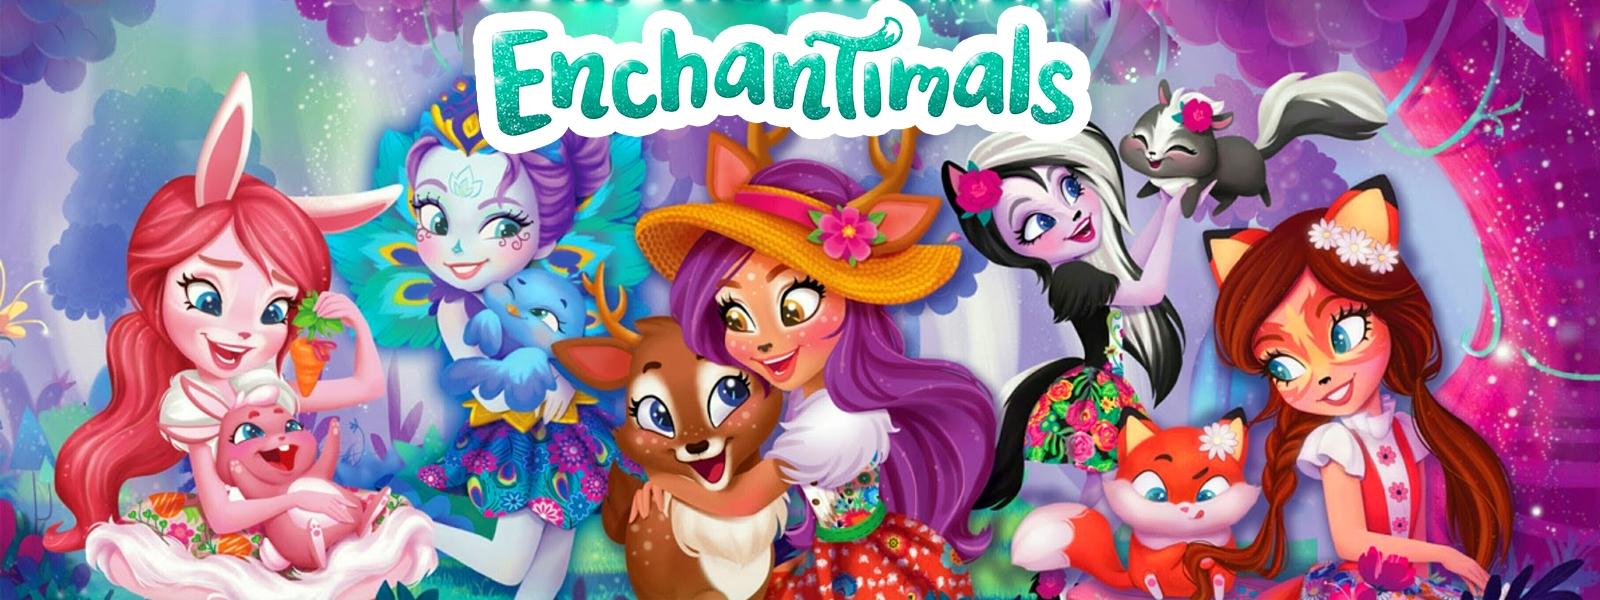 comprar enchantimals